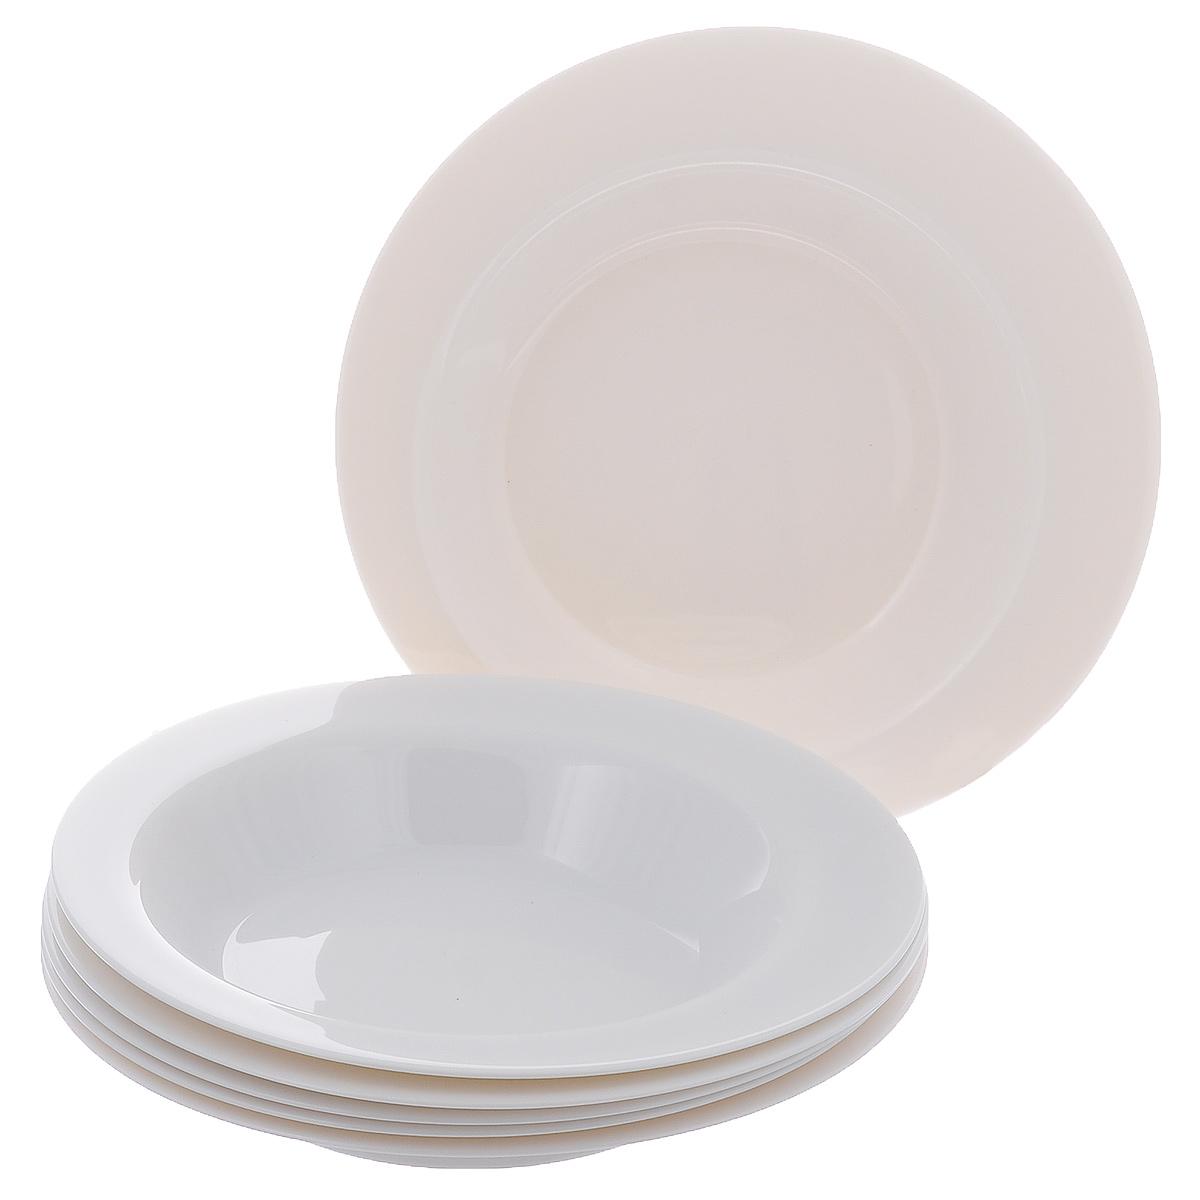 Набор суповых тарелок Bormioli Rocco Cometa, диаметр 24 см, 6 шт